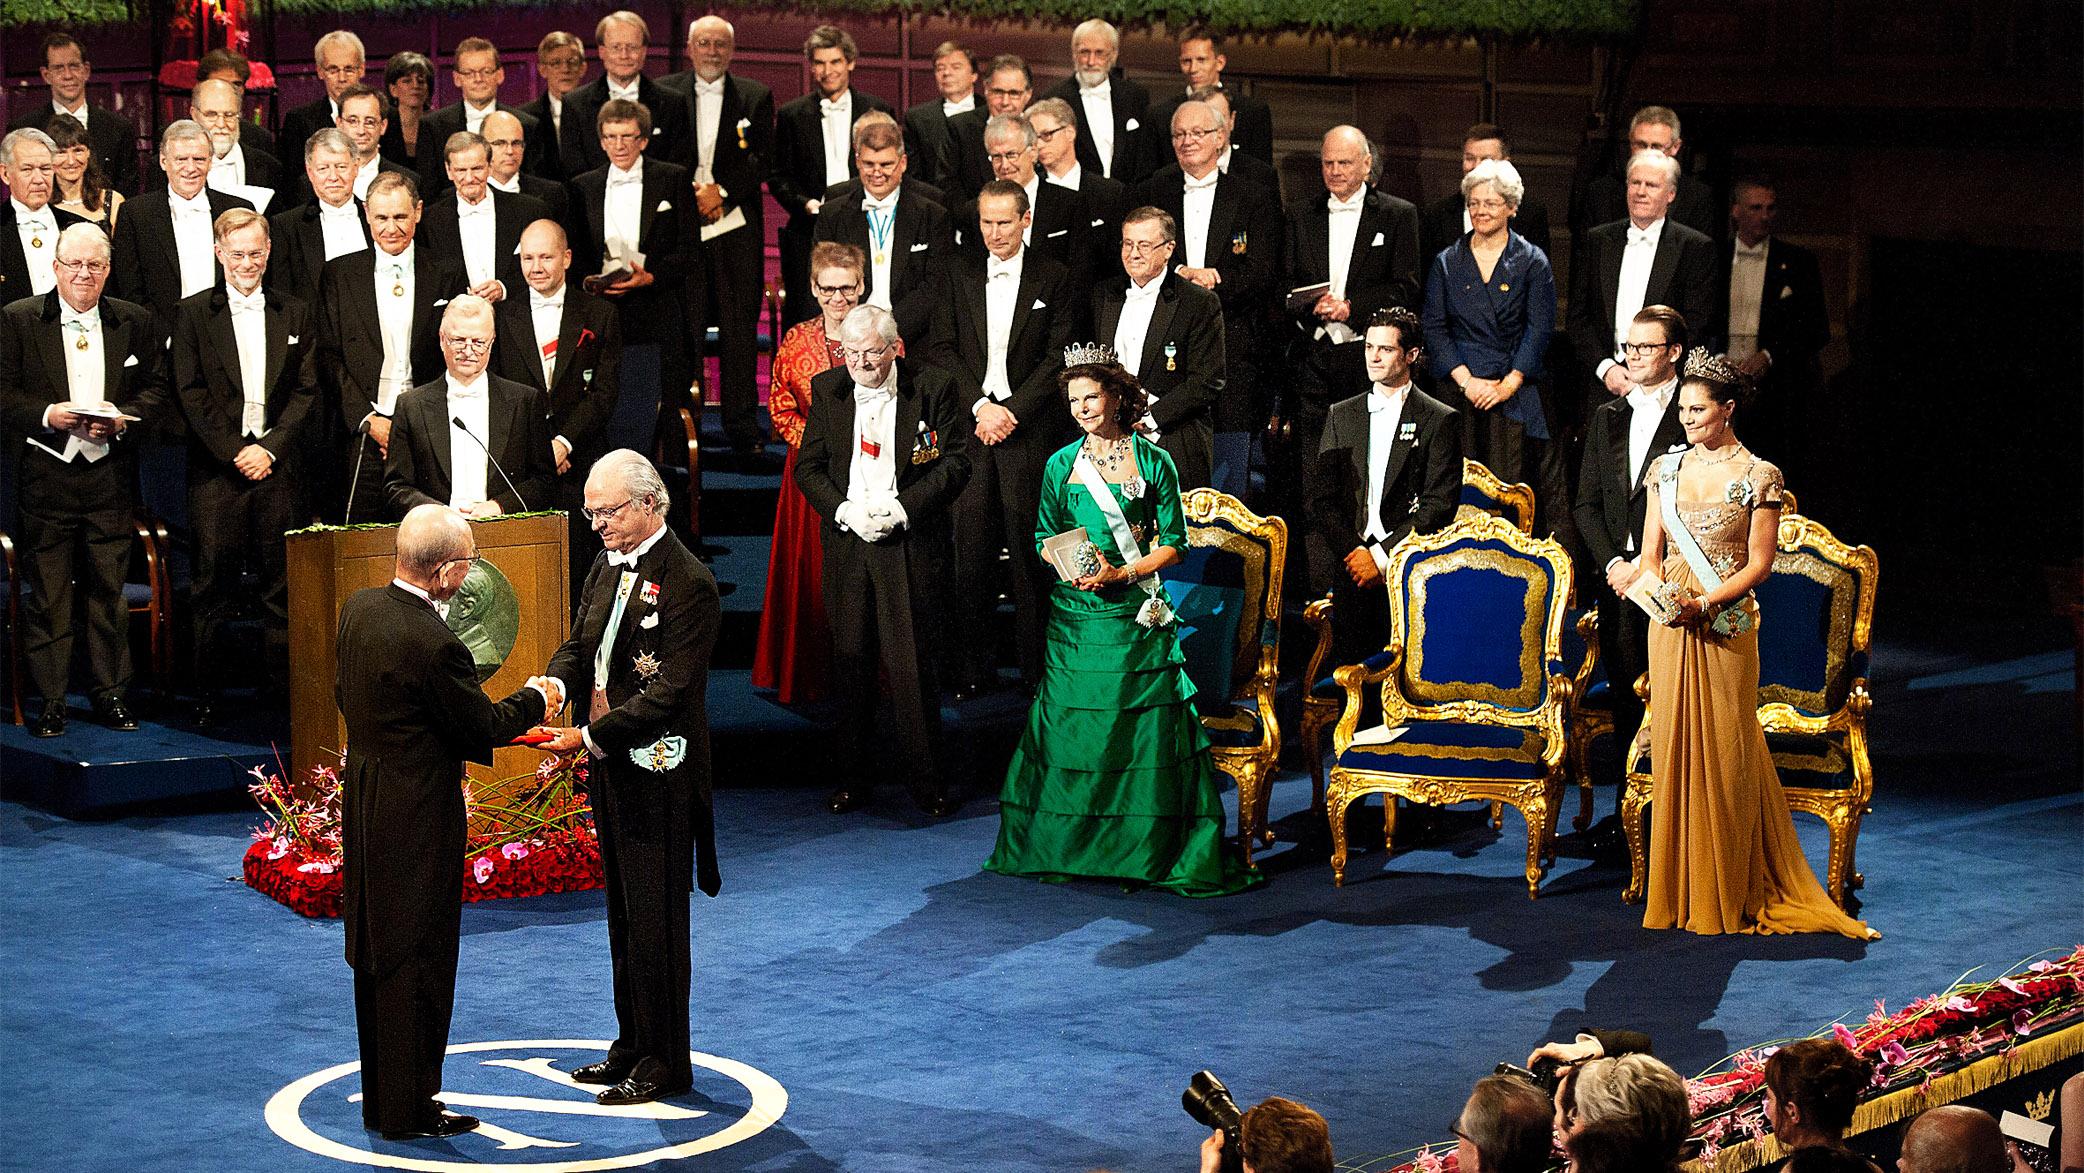 7 faktov, ktoré ste o Nobelovej cene nevedeli